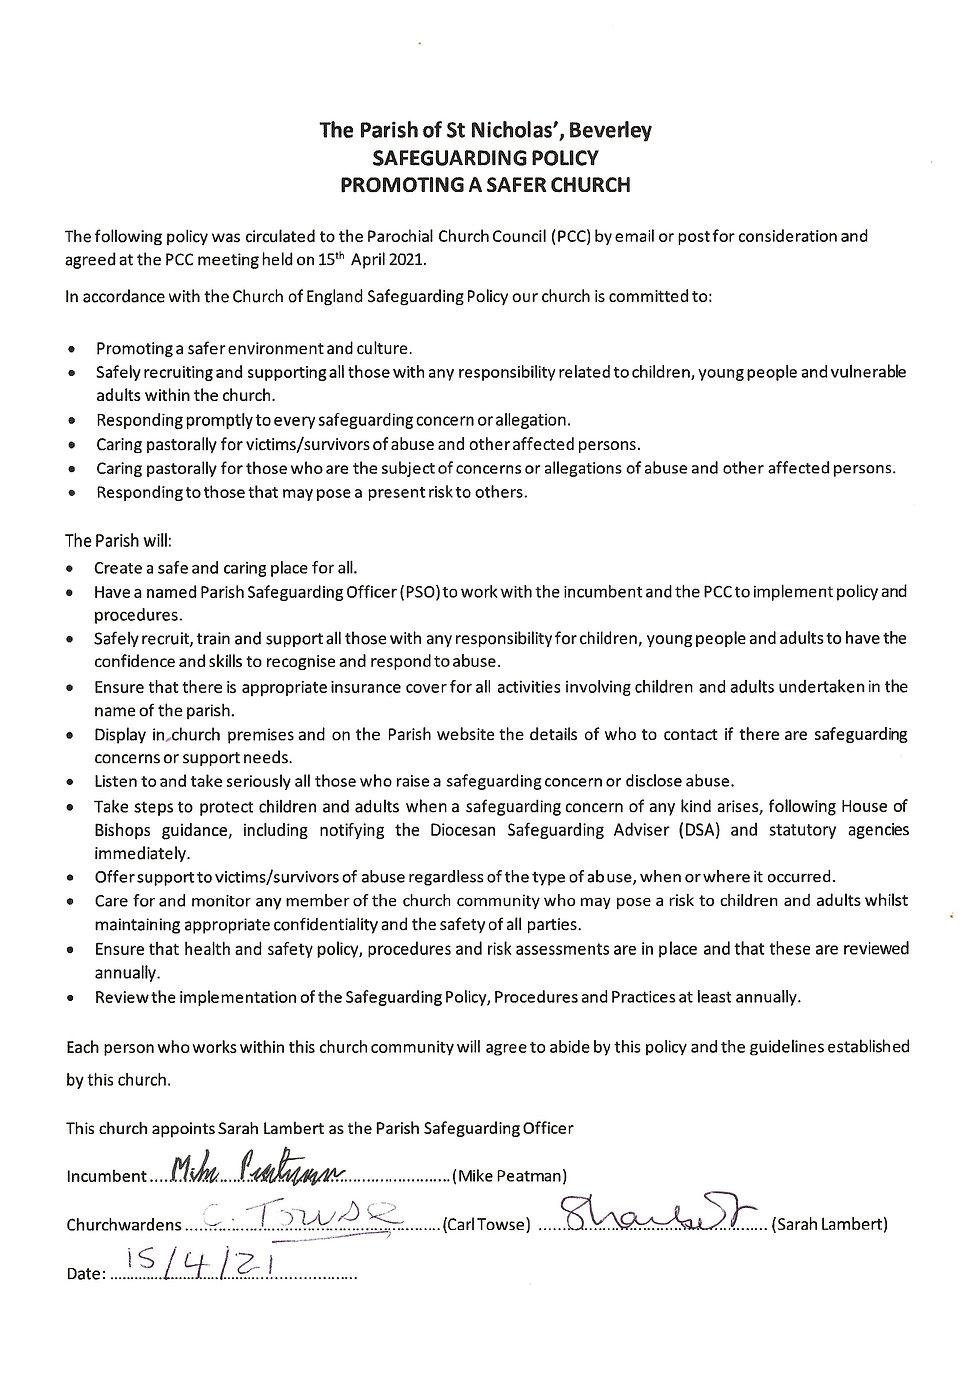 St Nicholas' Church Safeguarding Policy